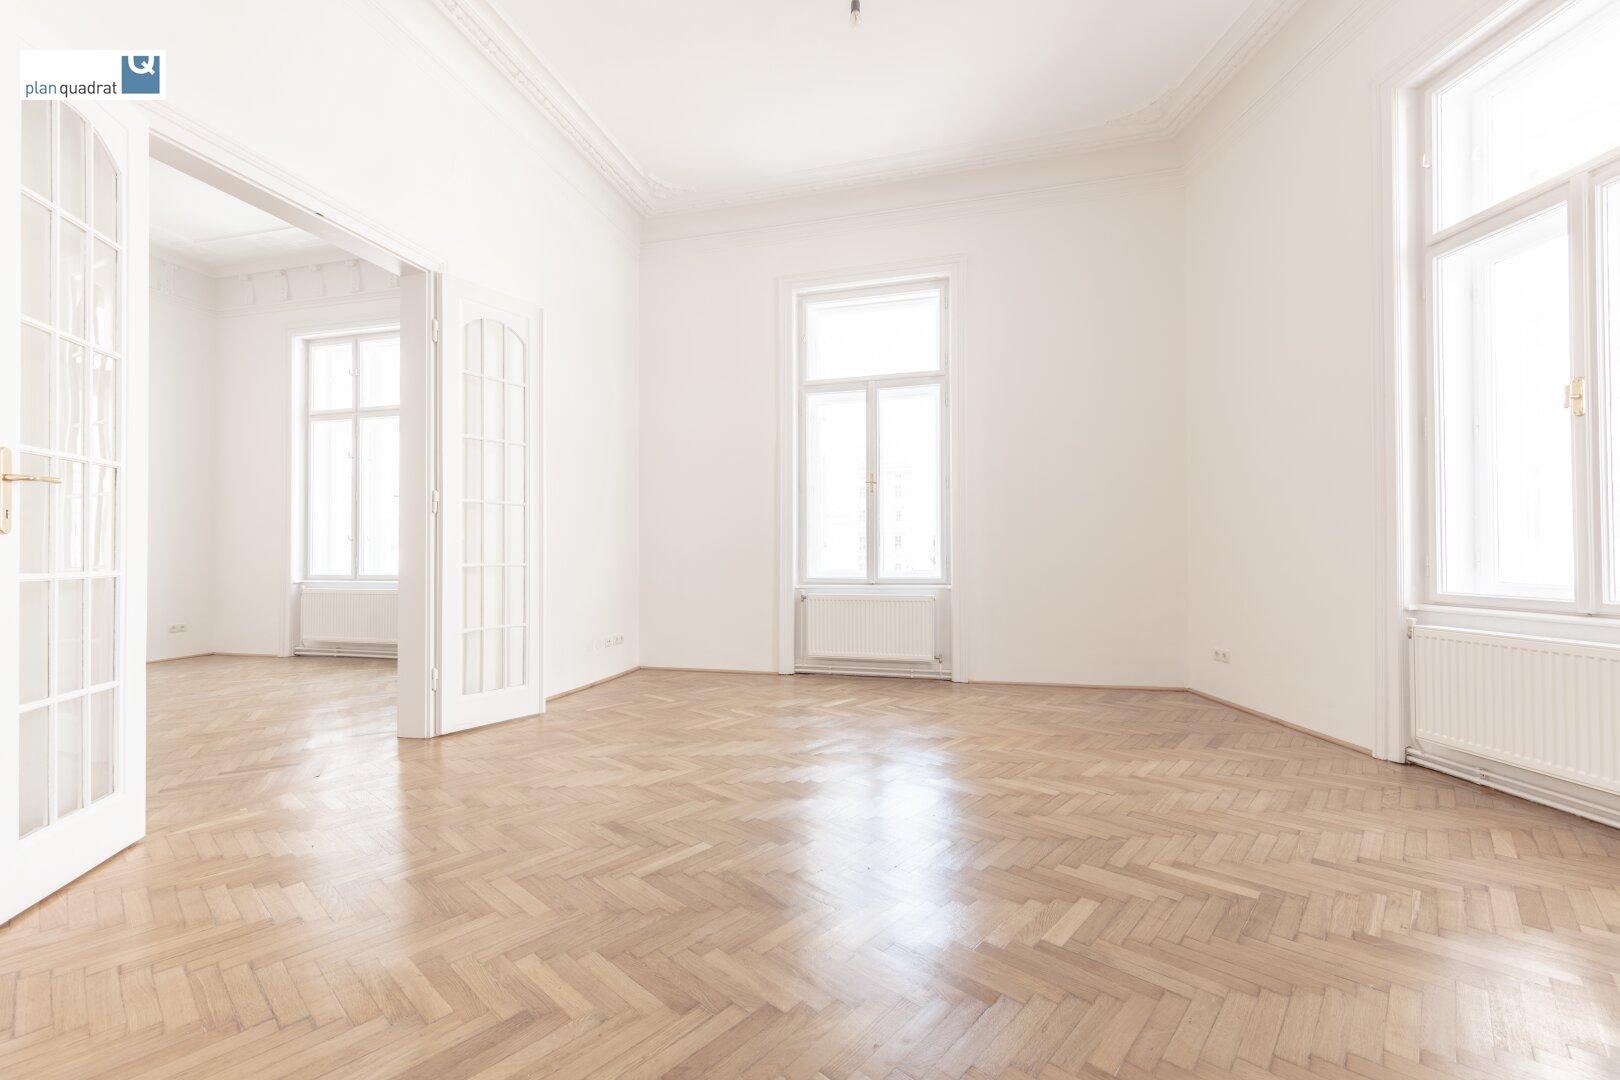 Raum 5 (gem. Grunsrissskizze - ca. 24,50 qm)